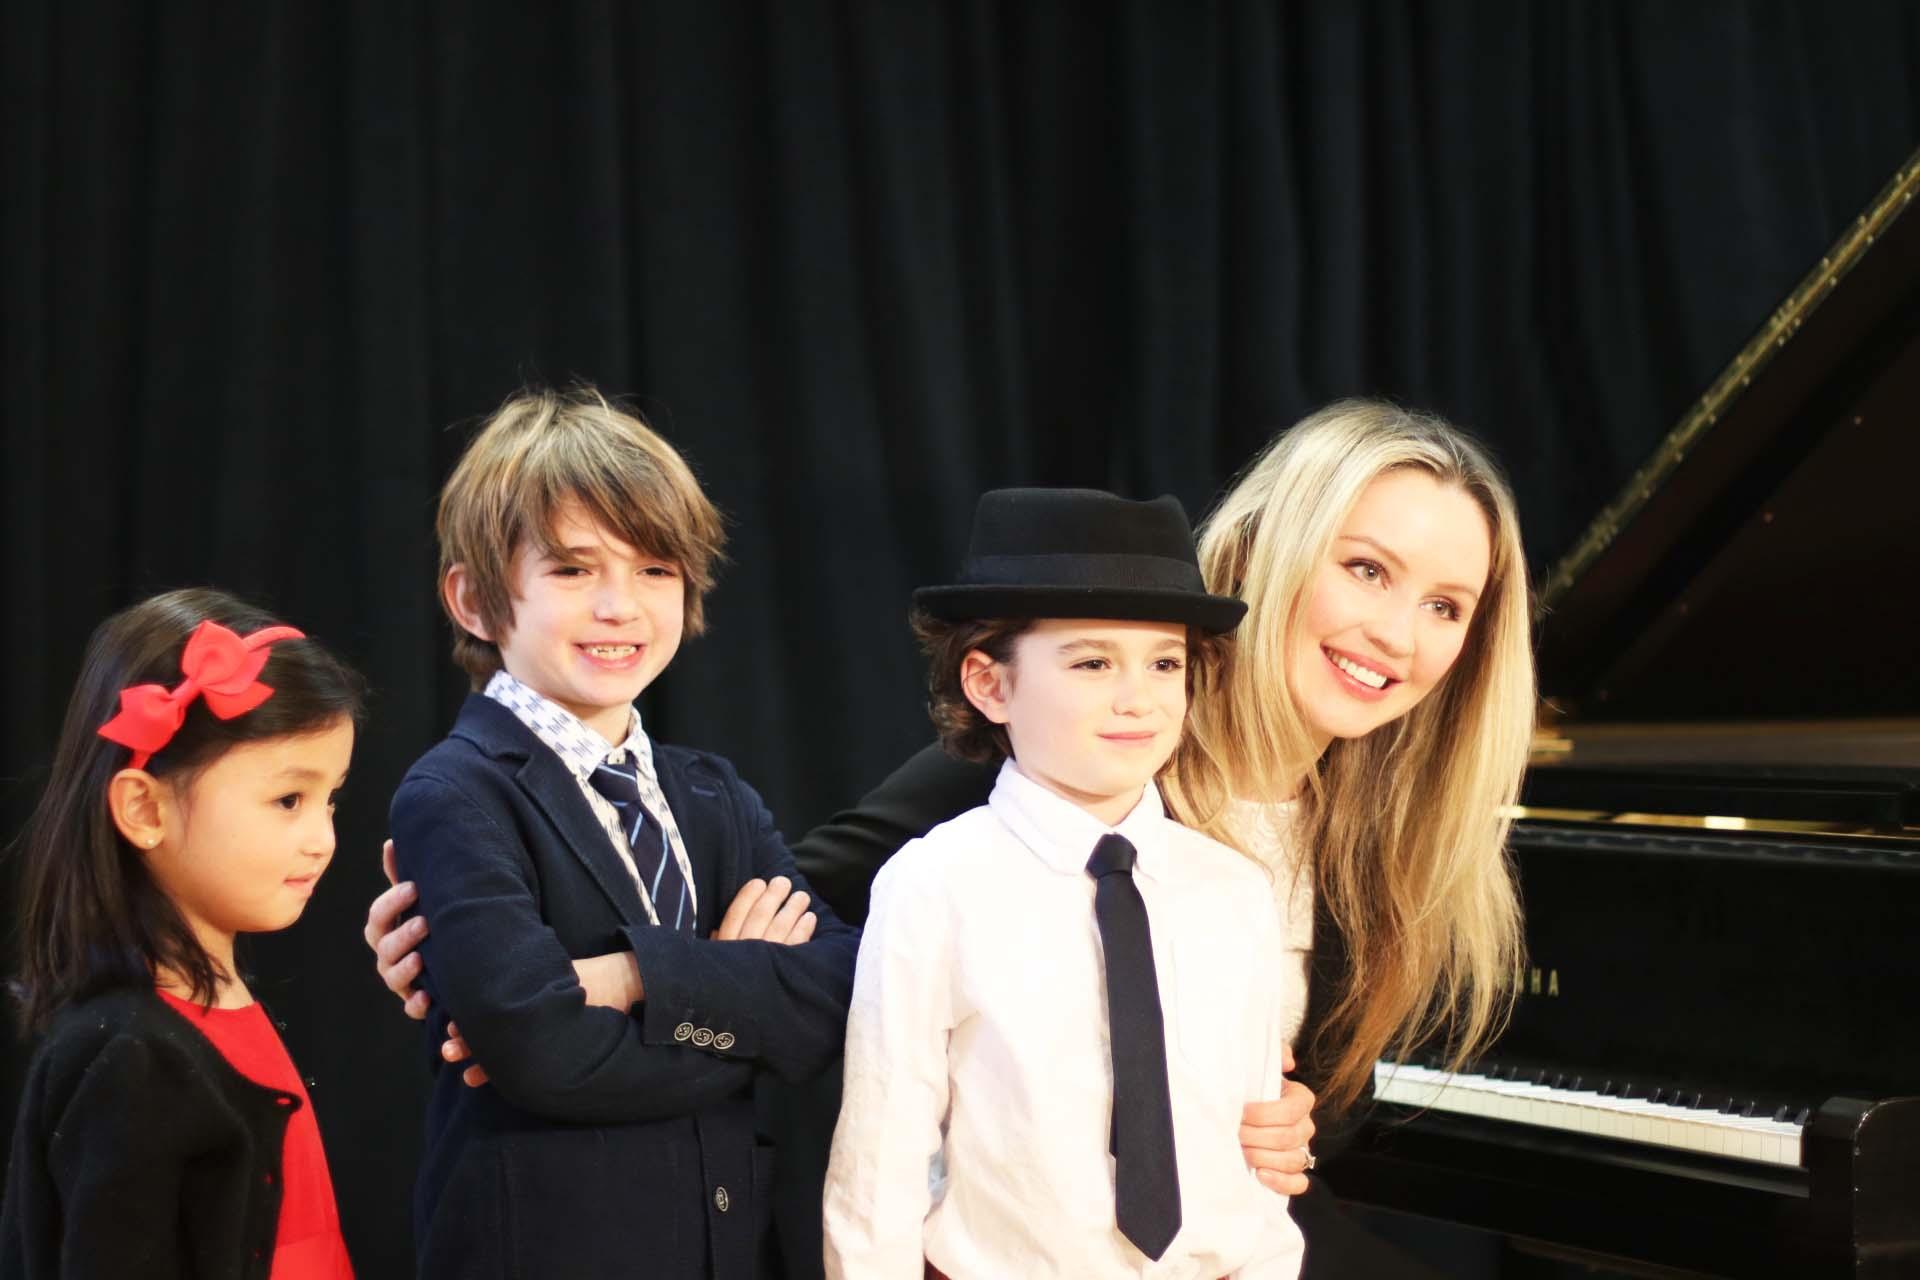 Piano students and Yuliya Higginbotham